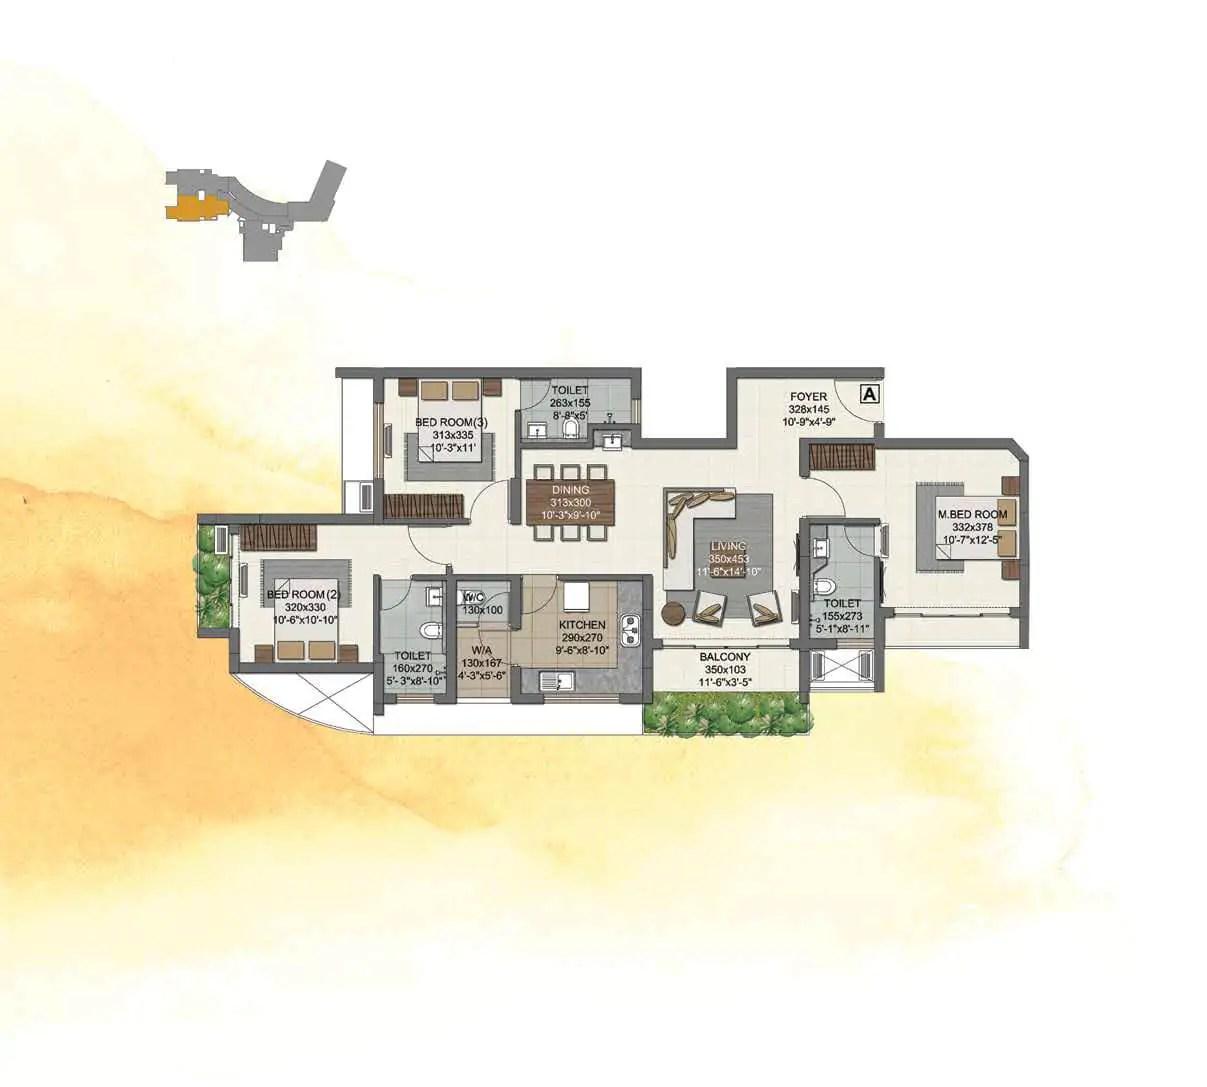 UNIT A (3 BHK) 13TH FLOOR